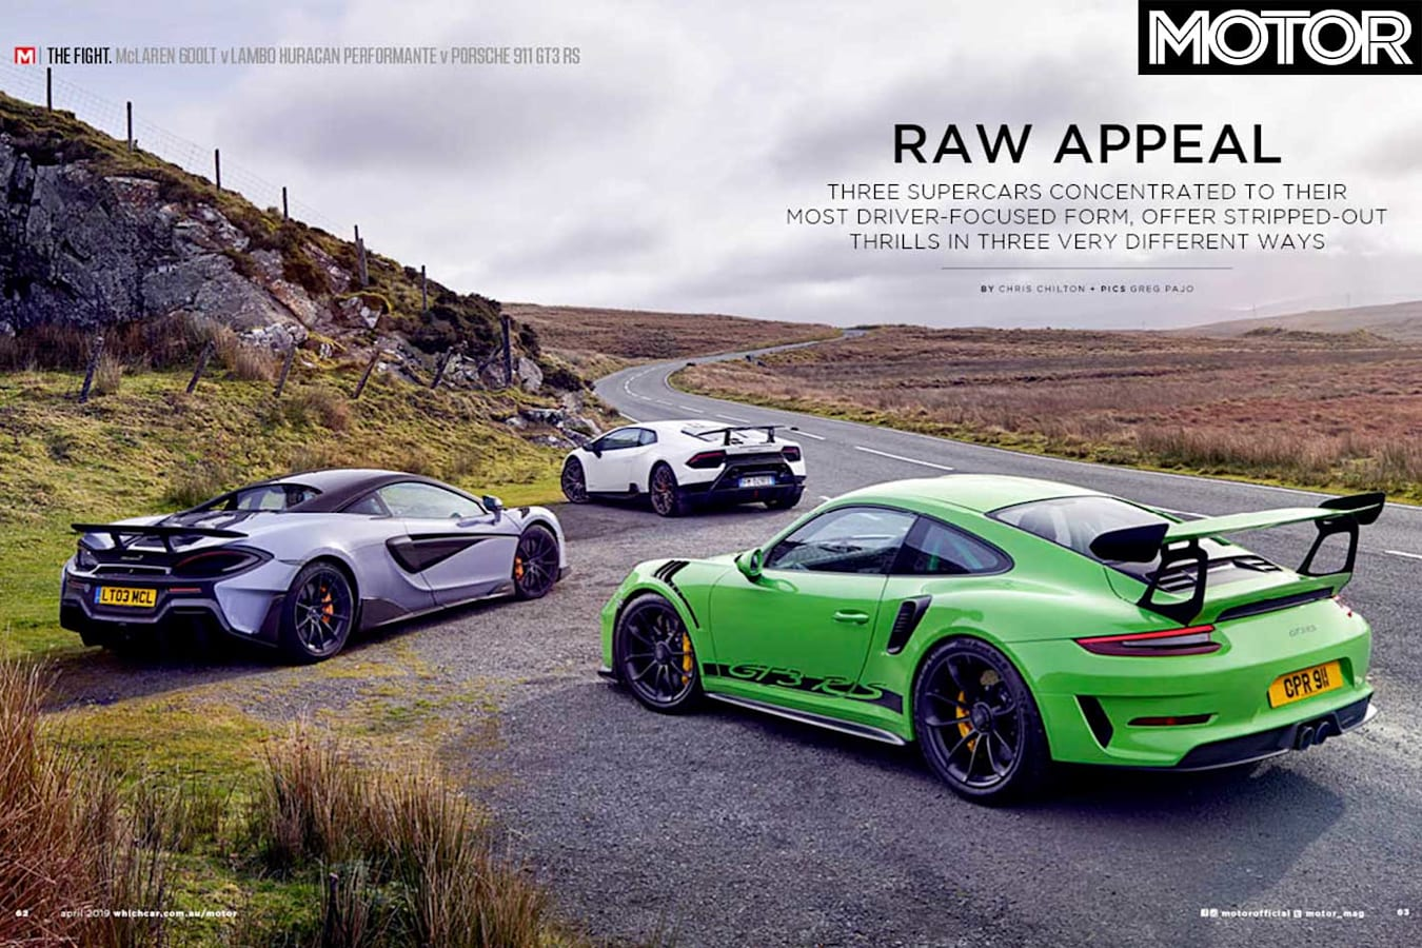 MOTOR Magazine April 2019 Issue Mc Laren 600 LT Vs Lamborghini Huracan Performante Vs Porsche 911 GT 3 RS Feature Jpg